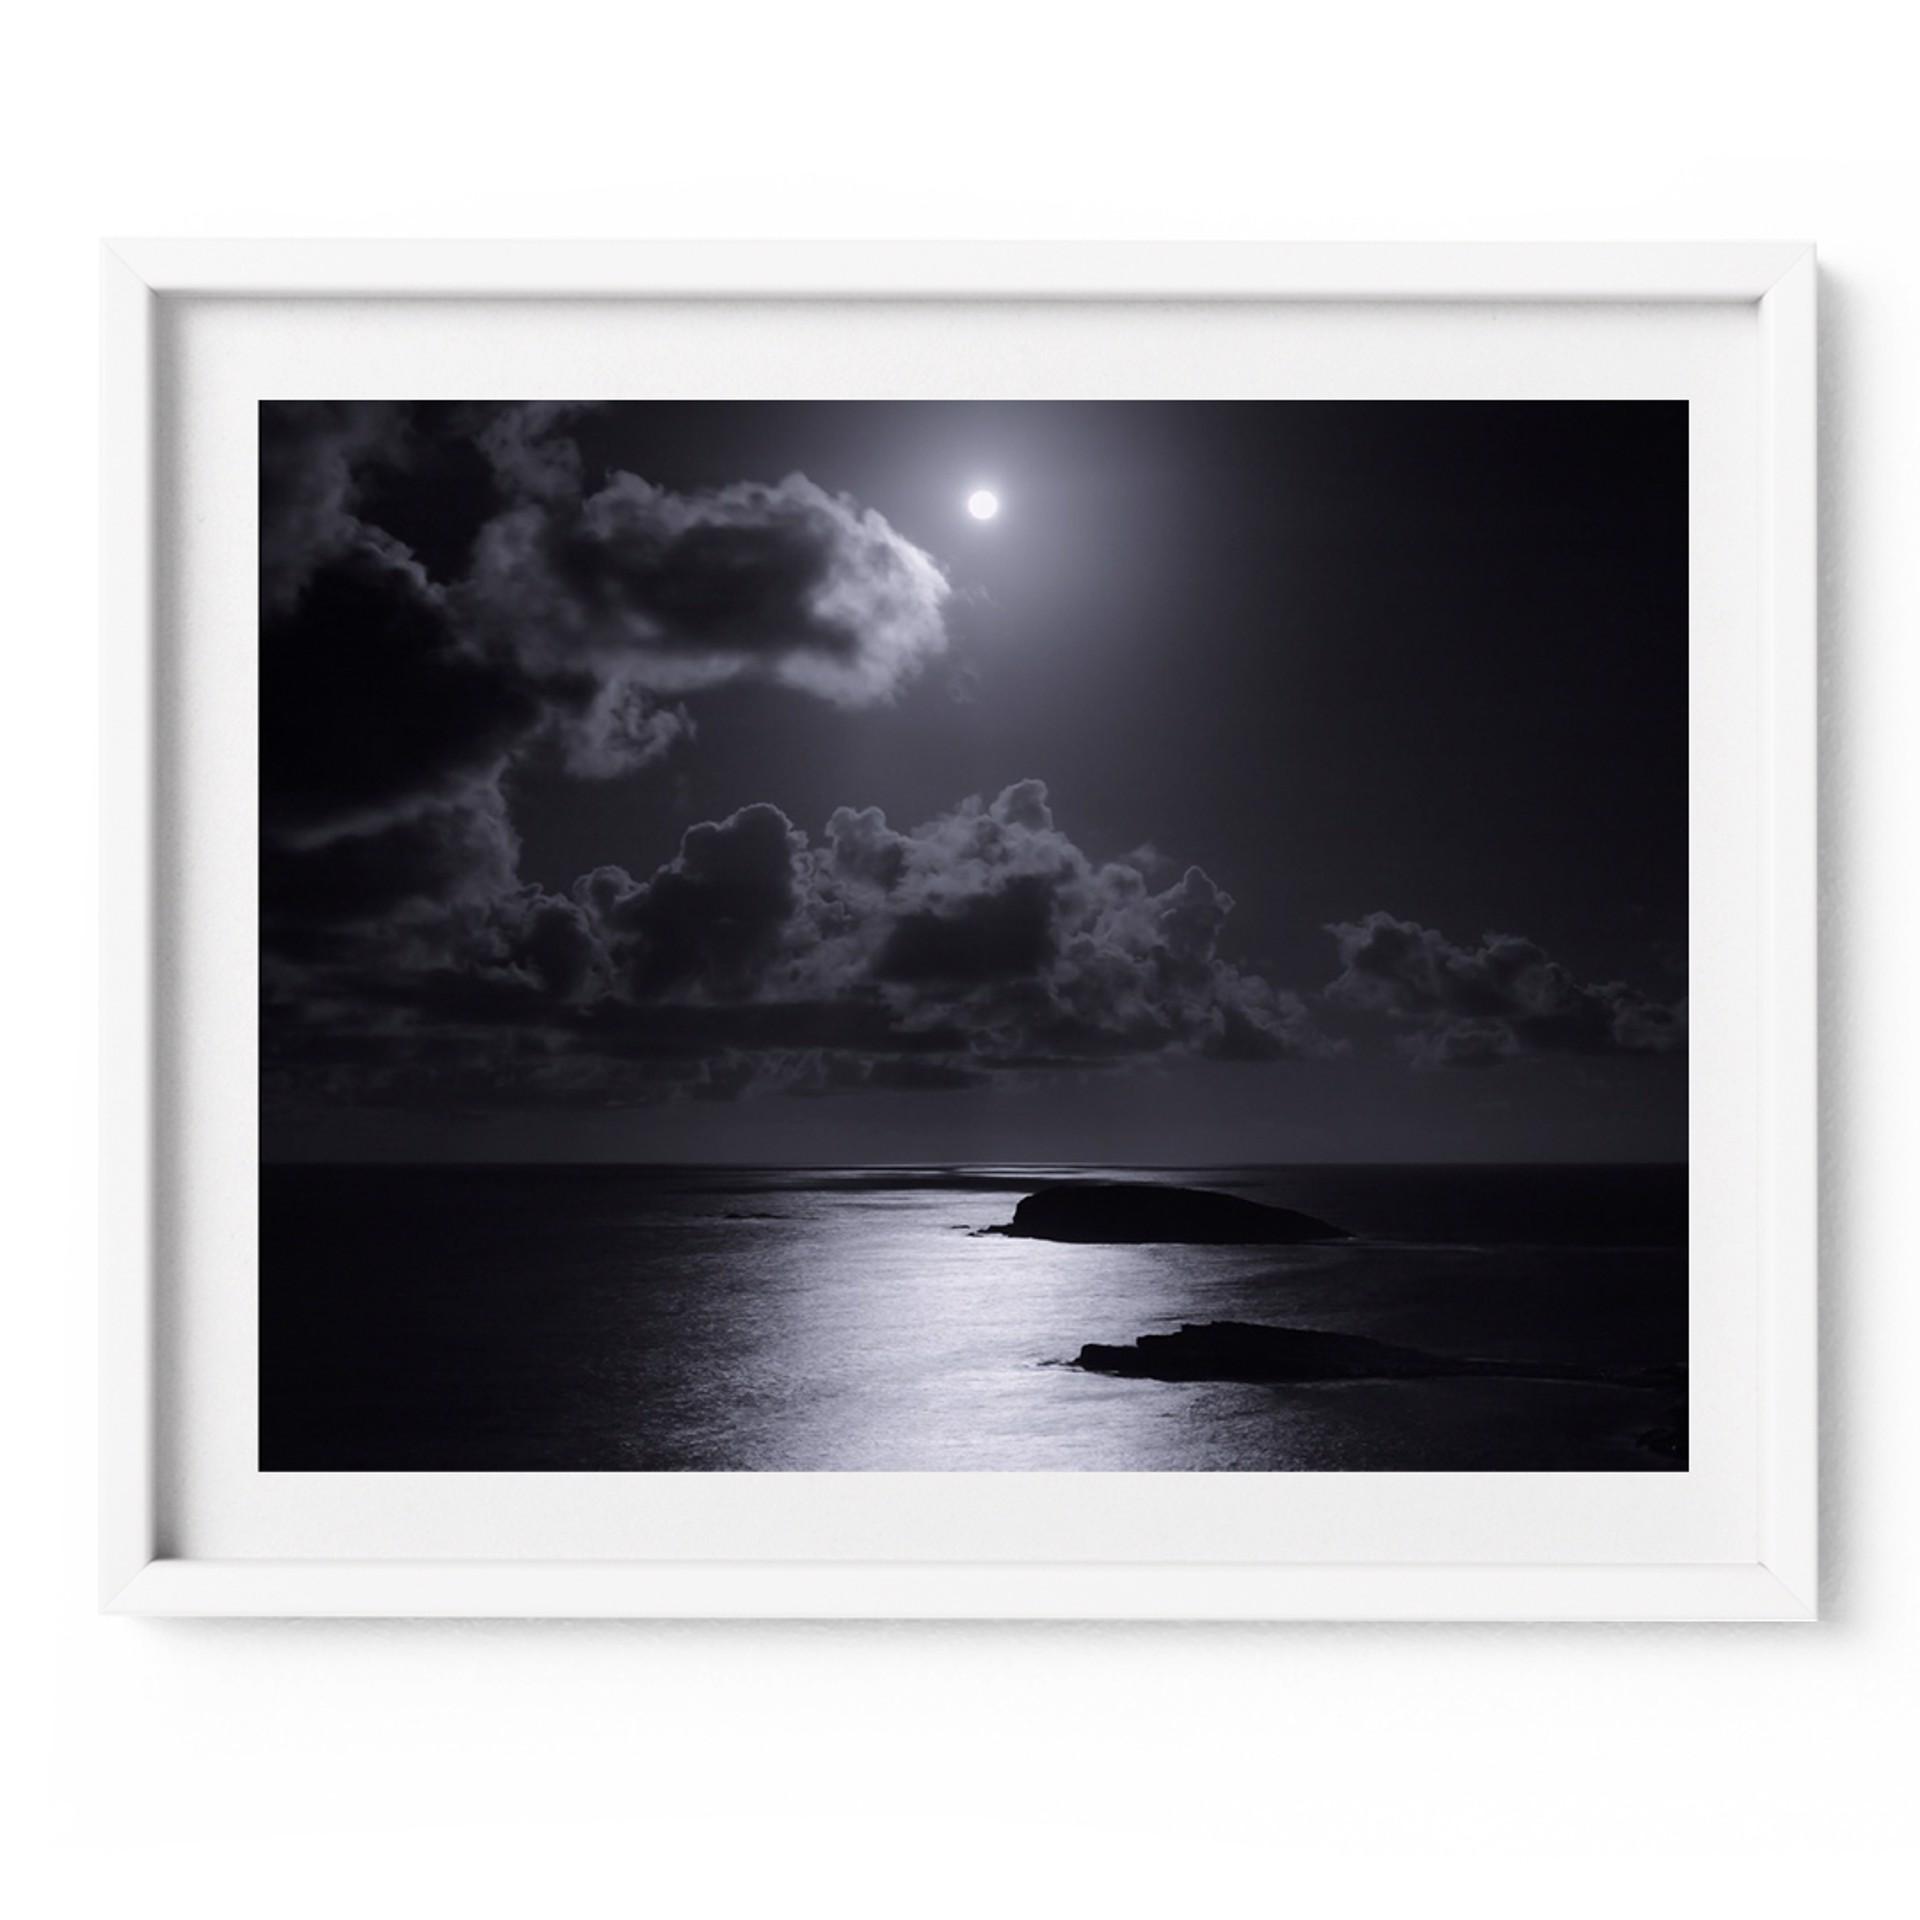 Moonscape #10 by Gabriella Imperatori-Penn